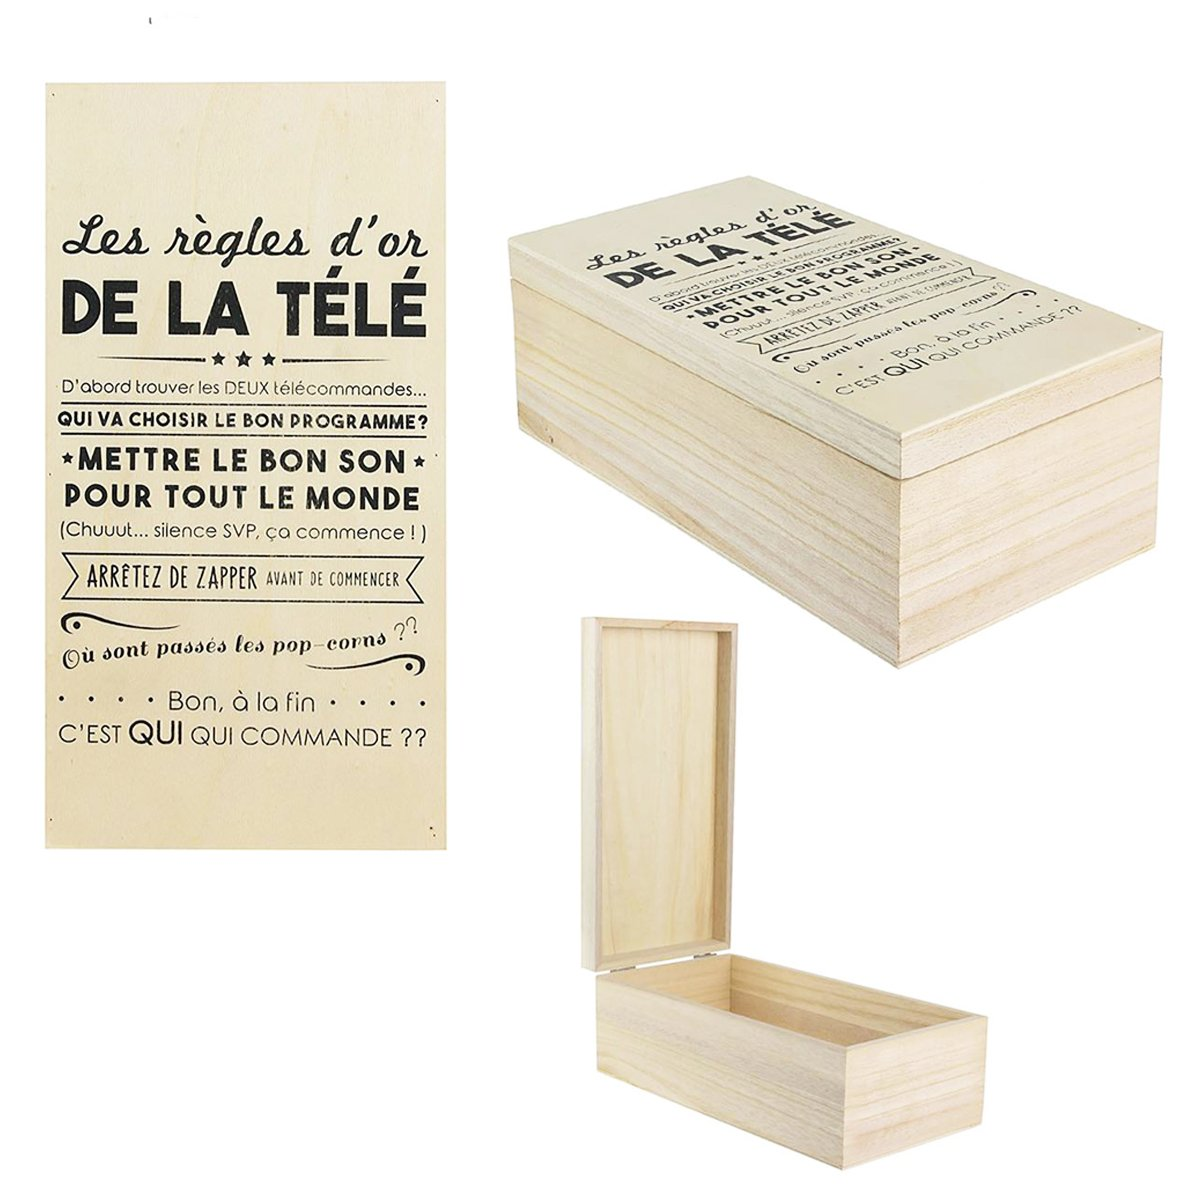 Les Tresors De Lily [Q0514] - Storage box wood remotes messages (the golden rules of tv)- 27x14x10 cm (10.63''x5.51''x3.94'').